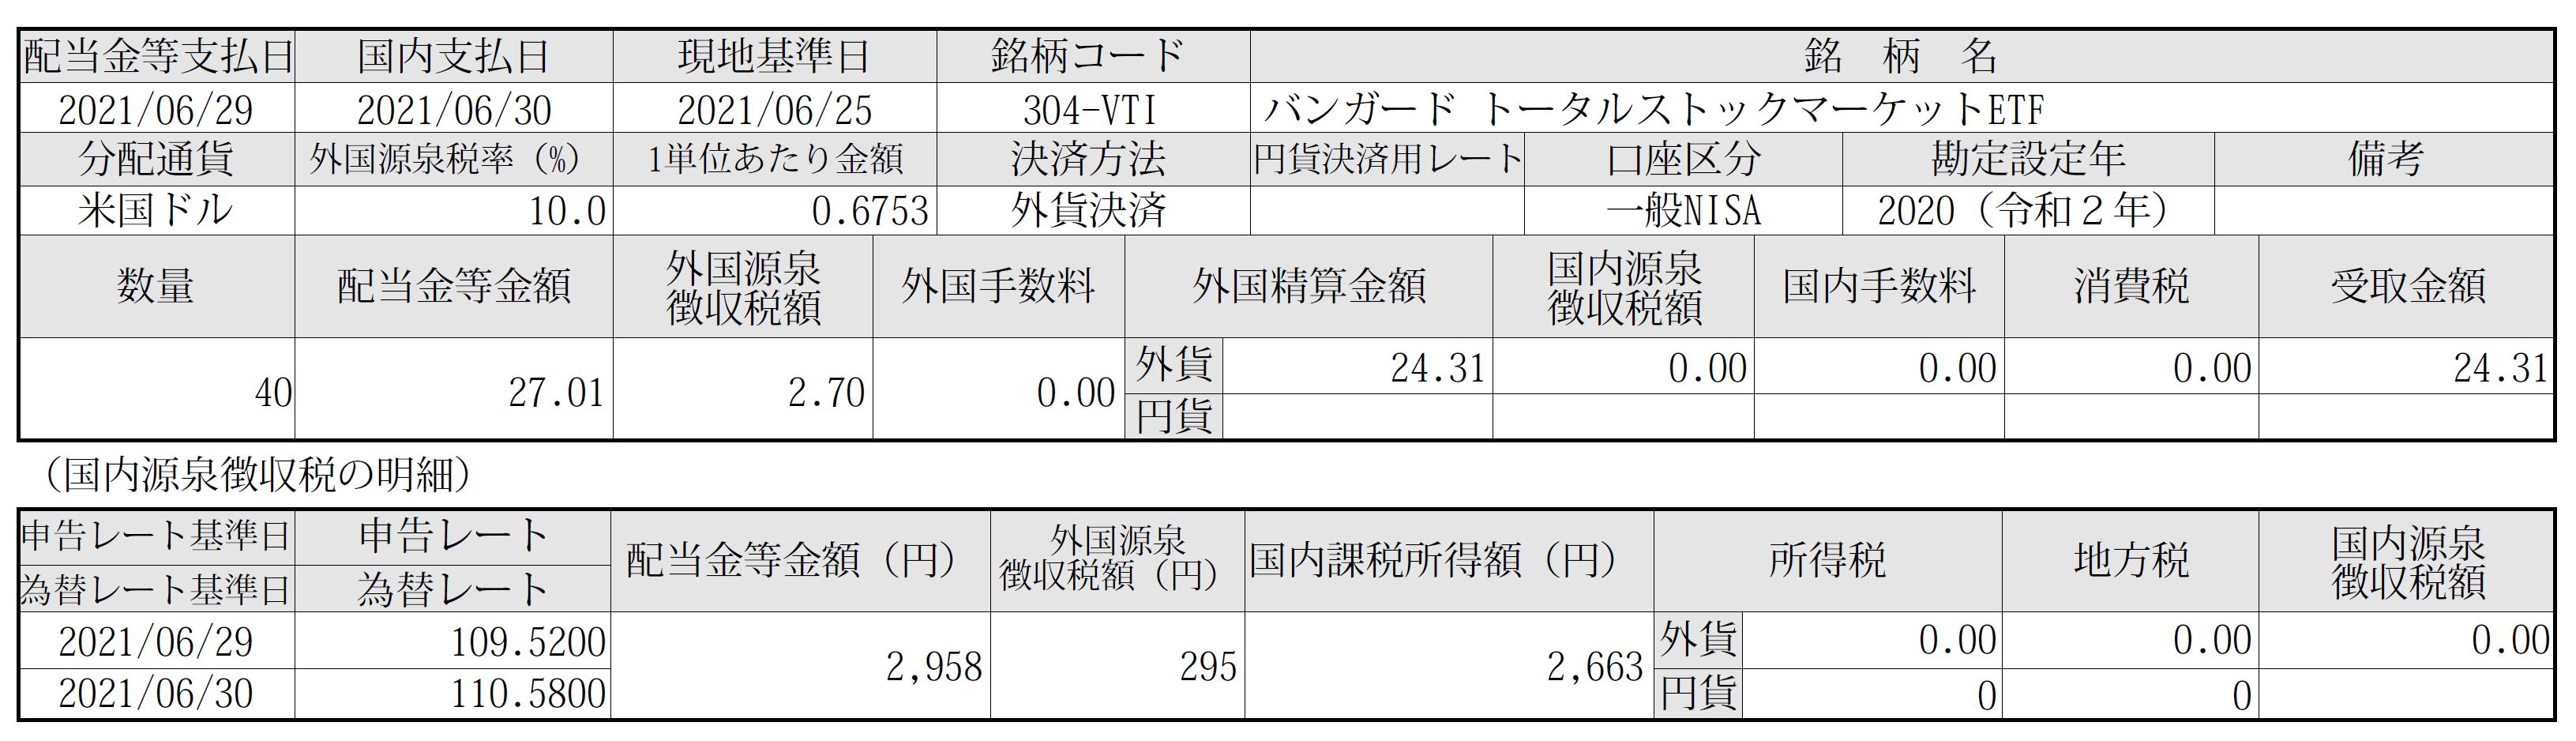 f:id:hodo-work:20210706193413p:plain